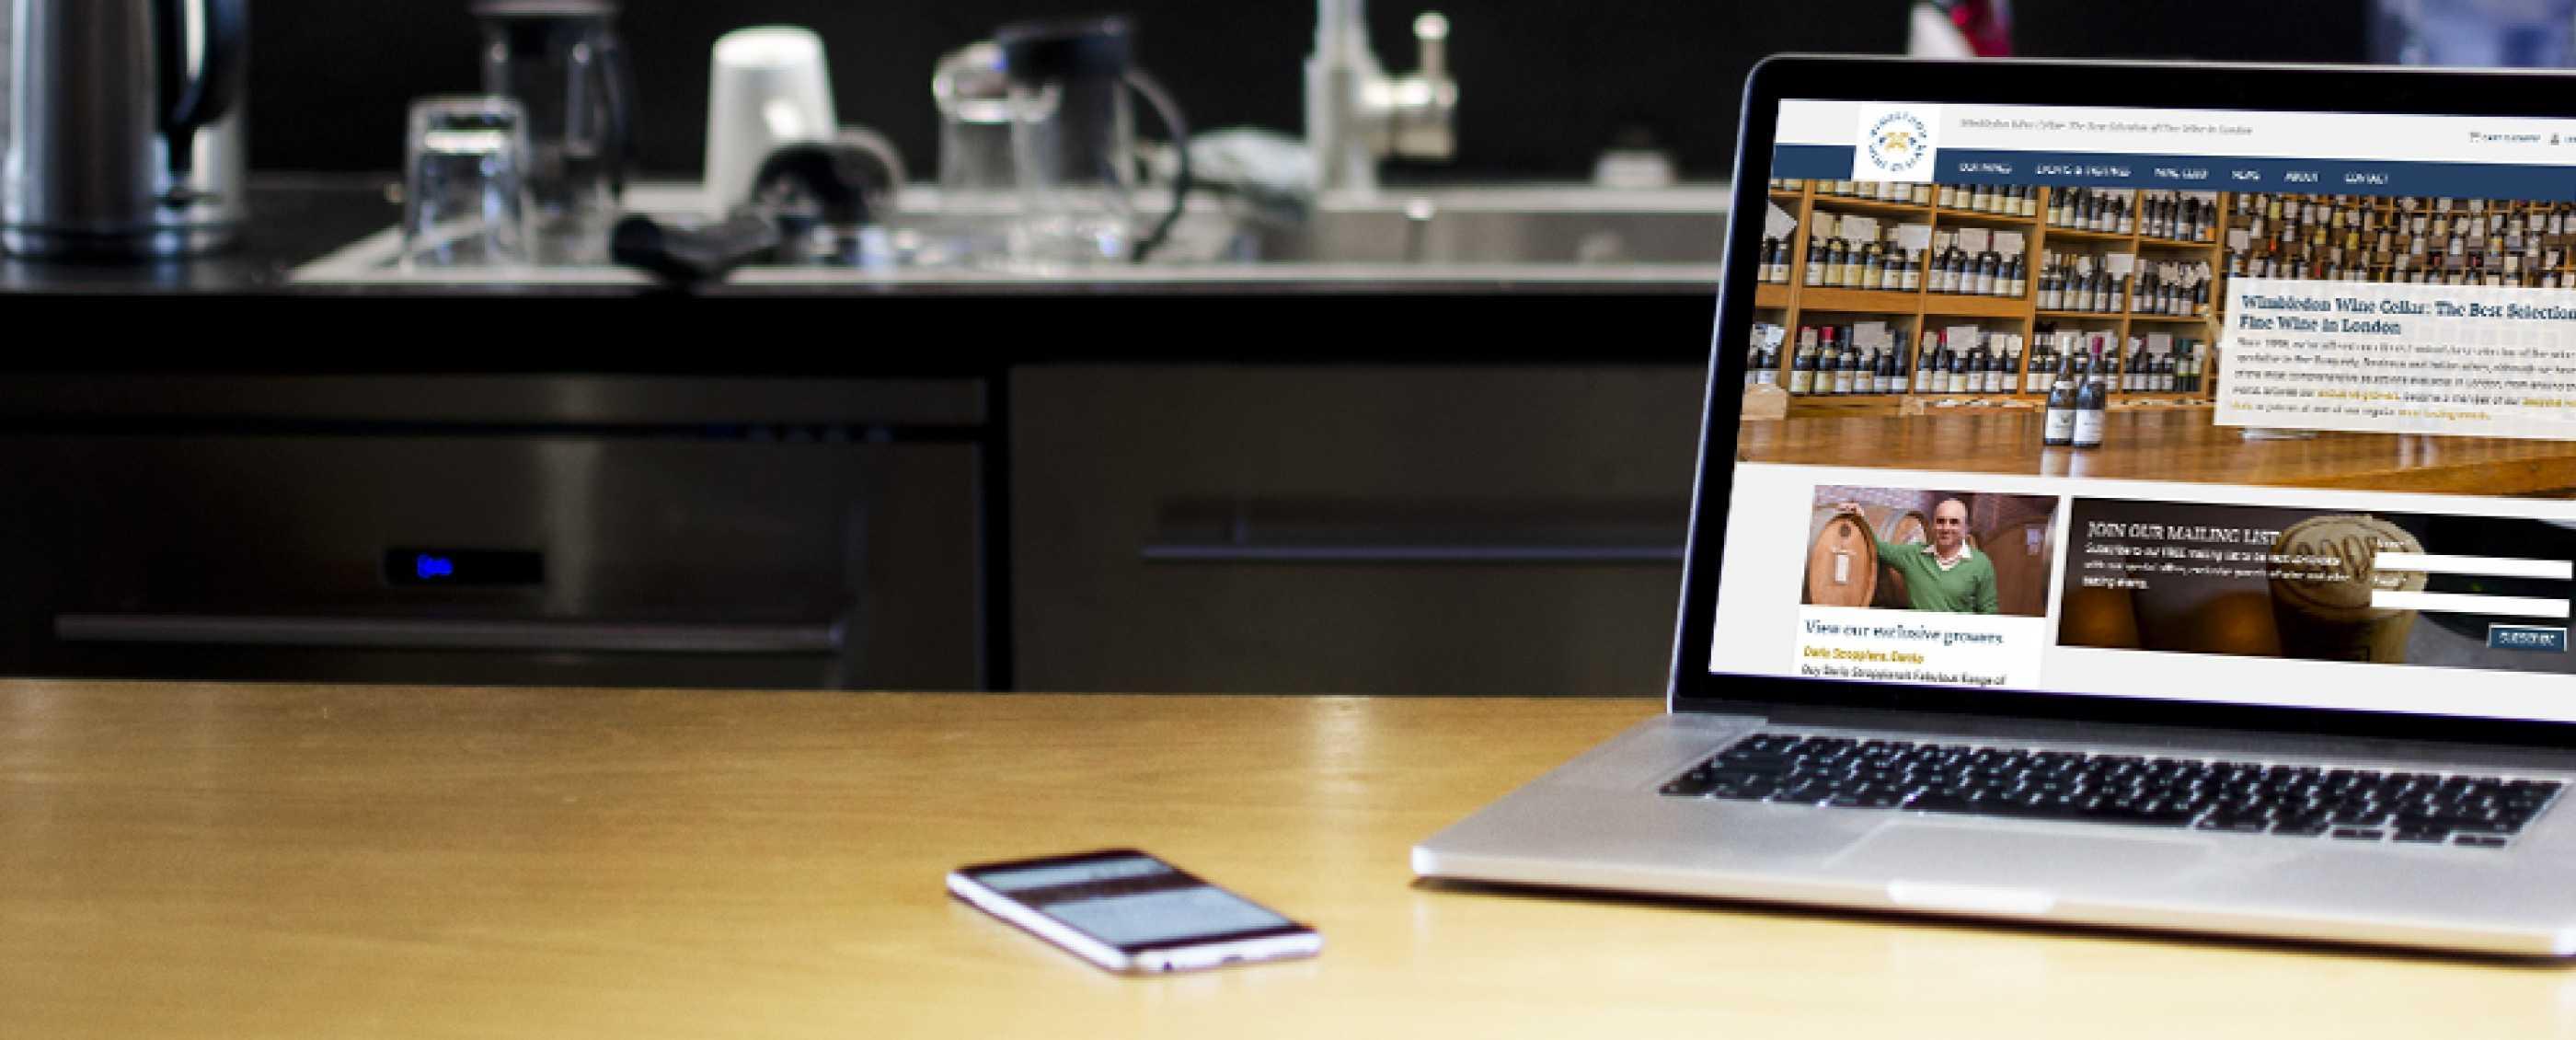 Wimbledon Wine Cellar wine website design on laptop and iphone